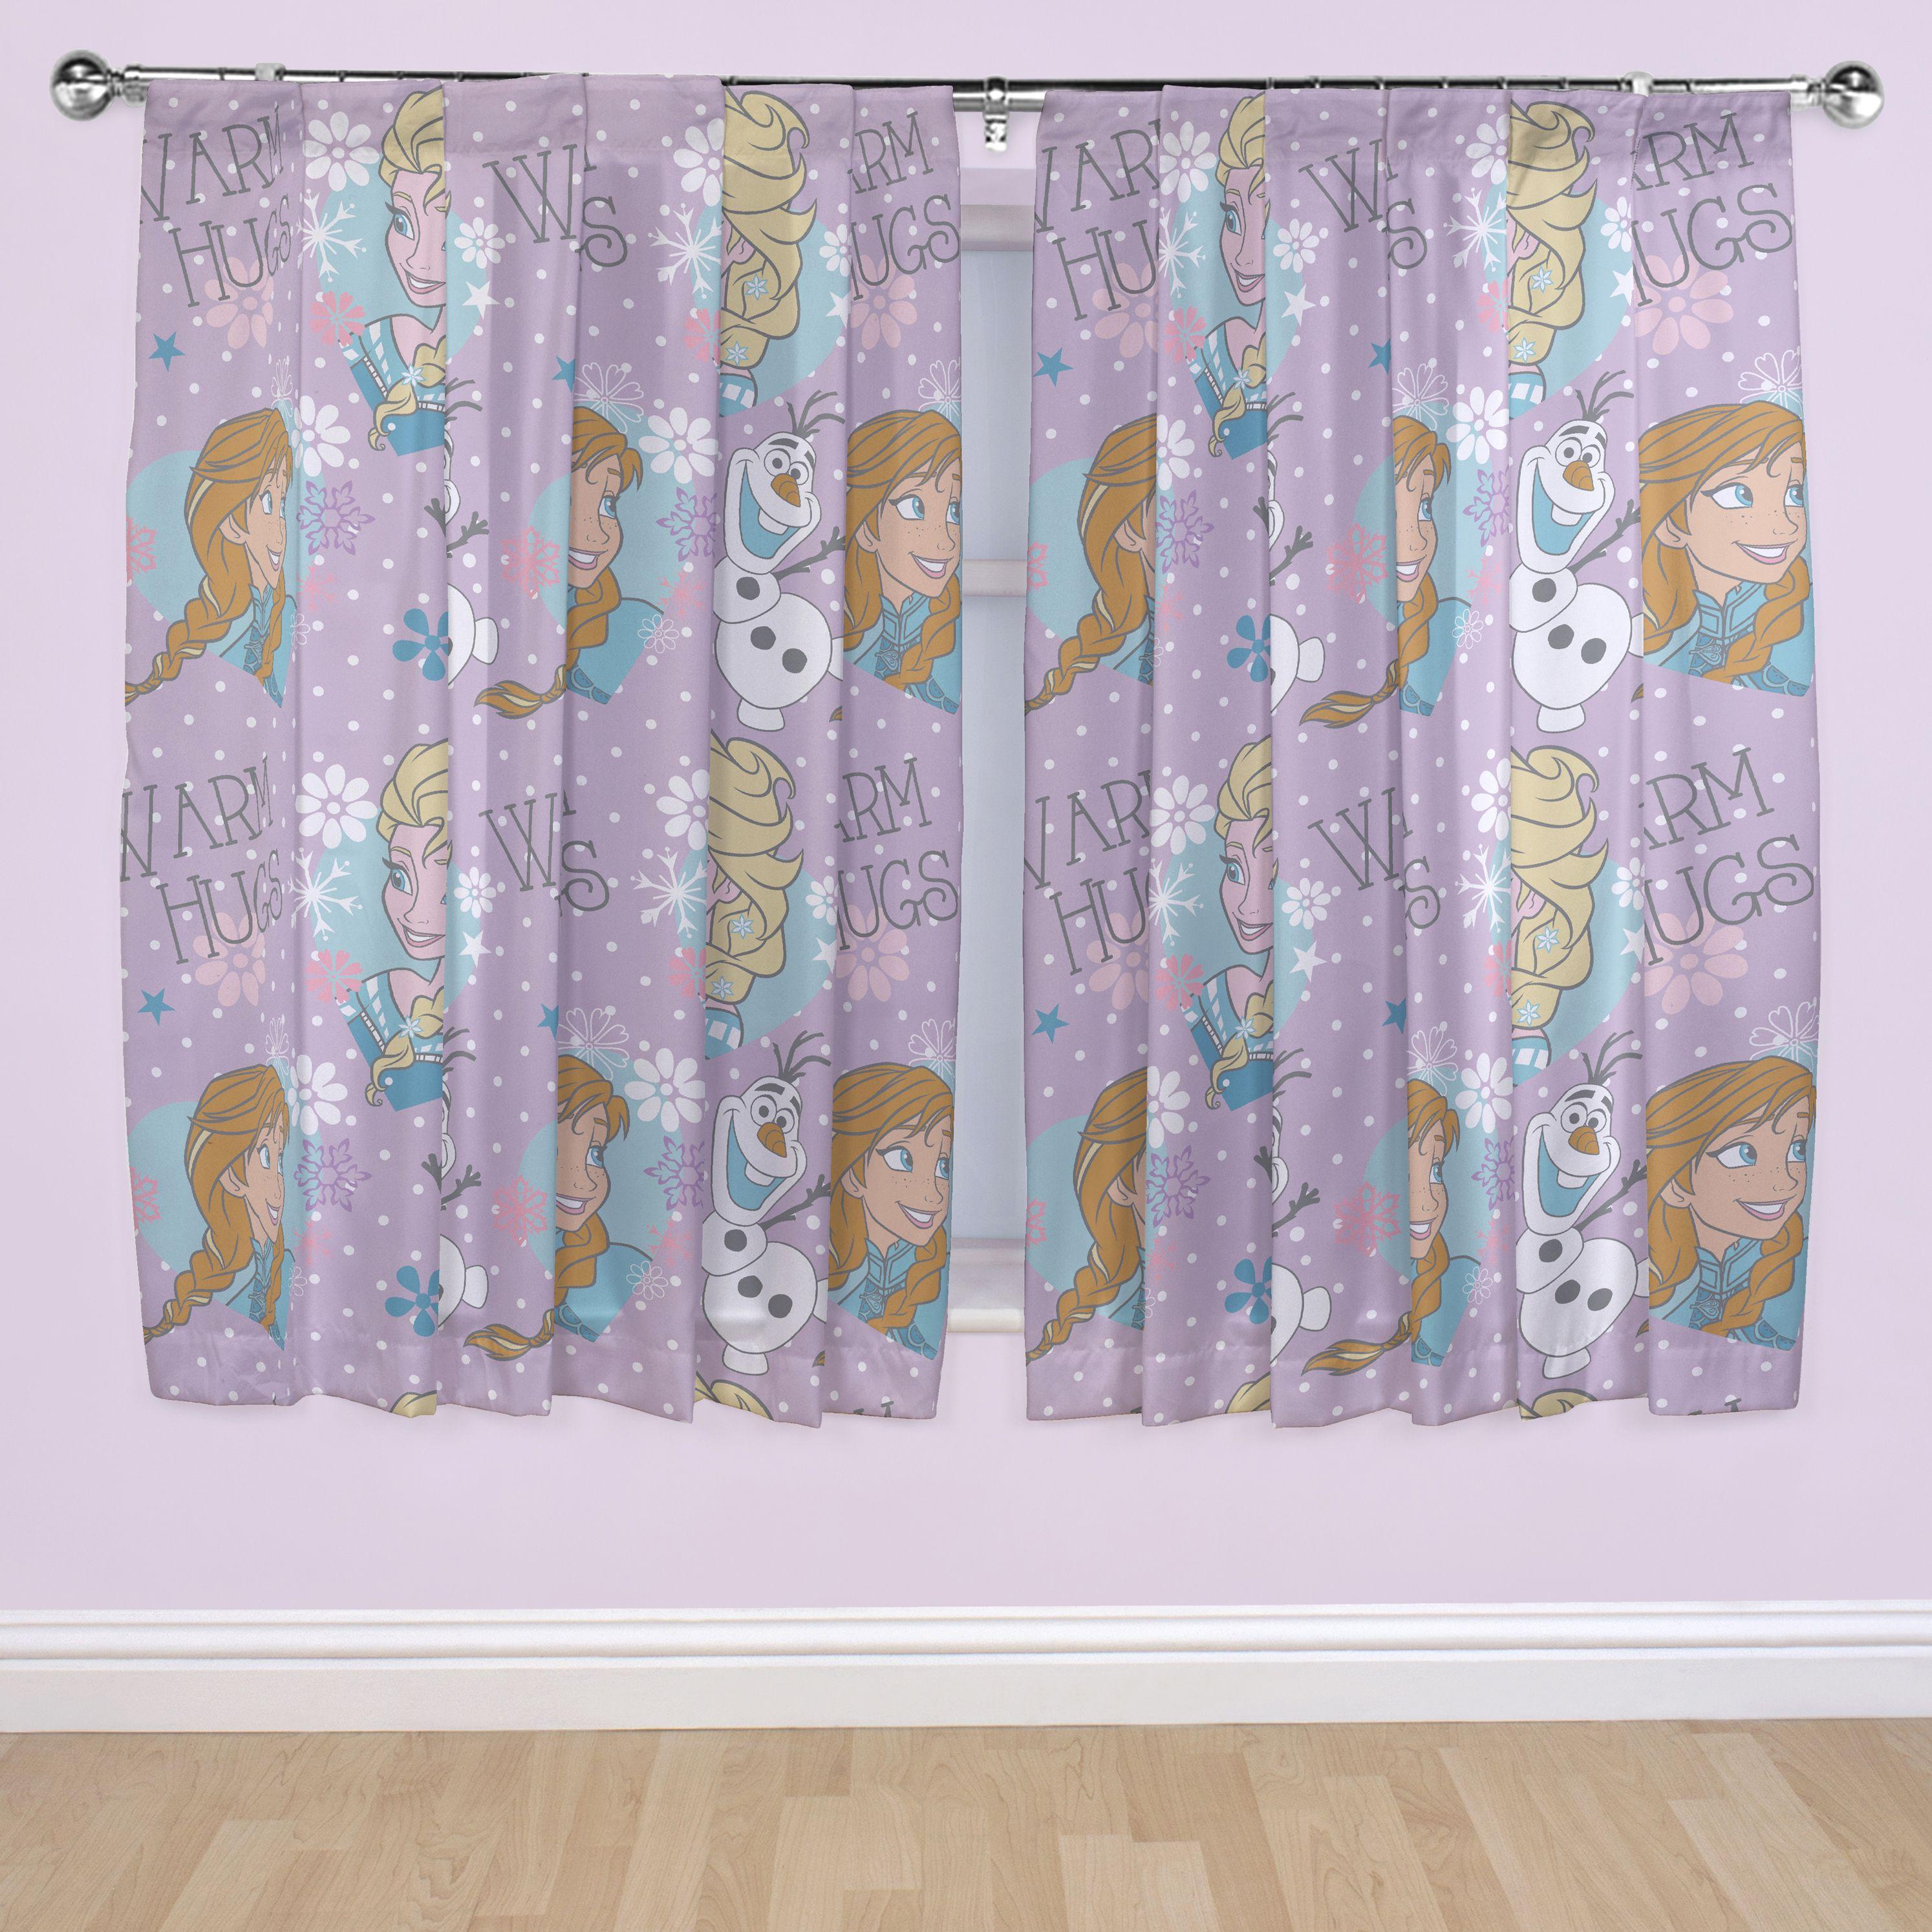 Lilac Bedroom Curtains Bedroom Curtain Diy